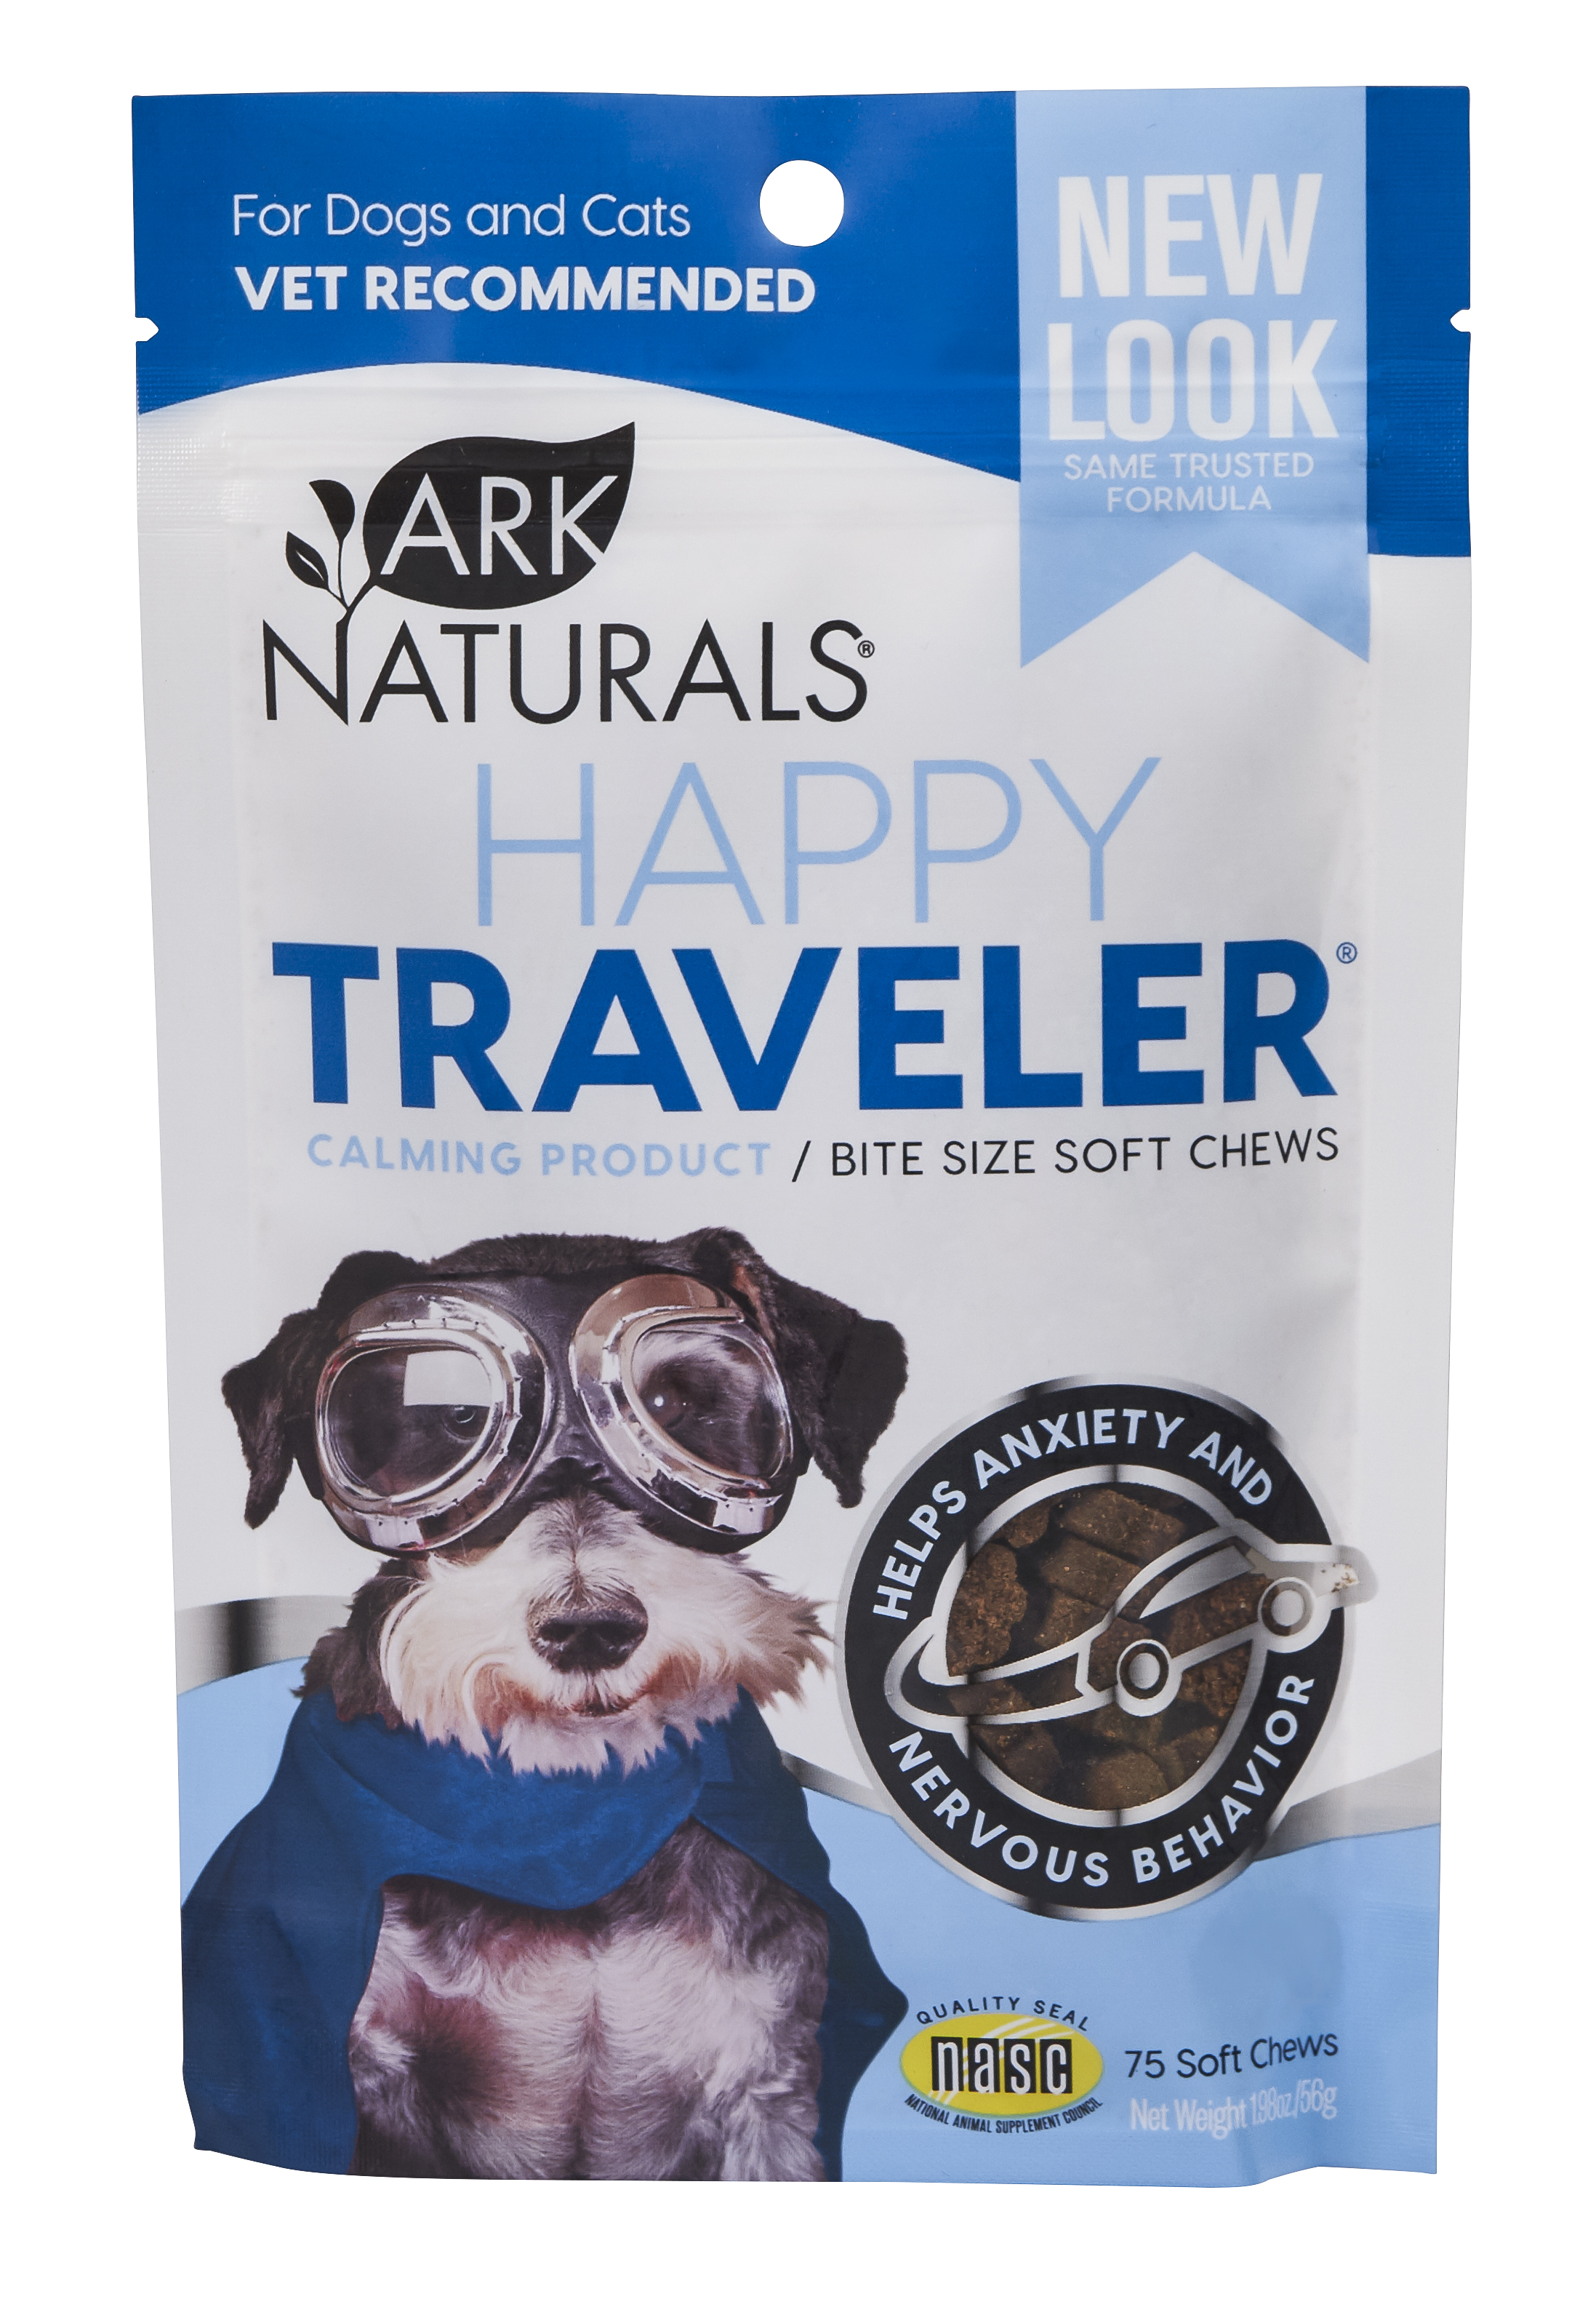 Ark Naturals Happy Traveler Dog & Cat Soft Chews, 75 count